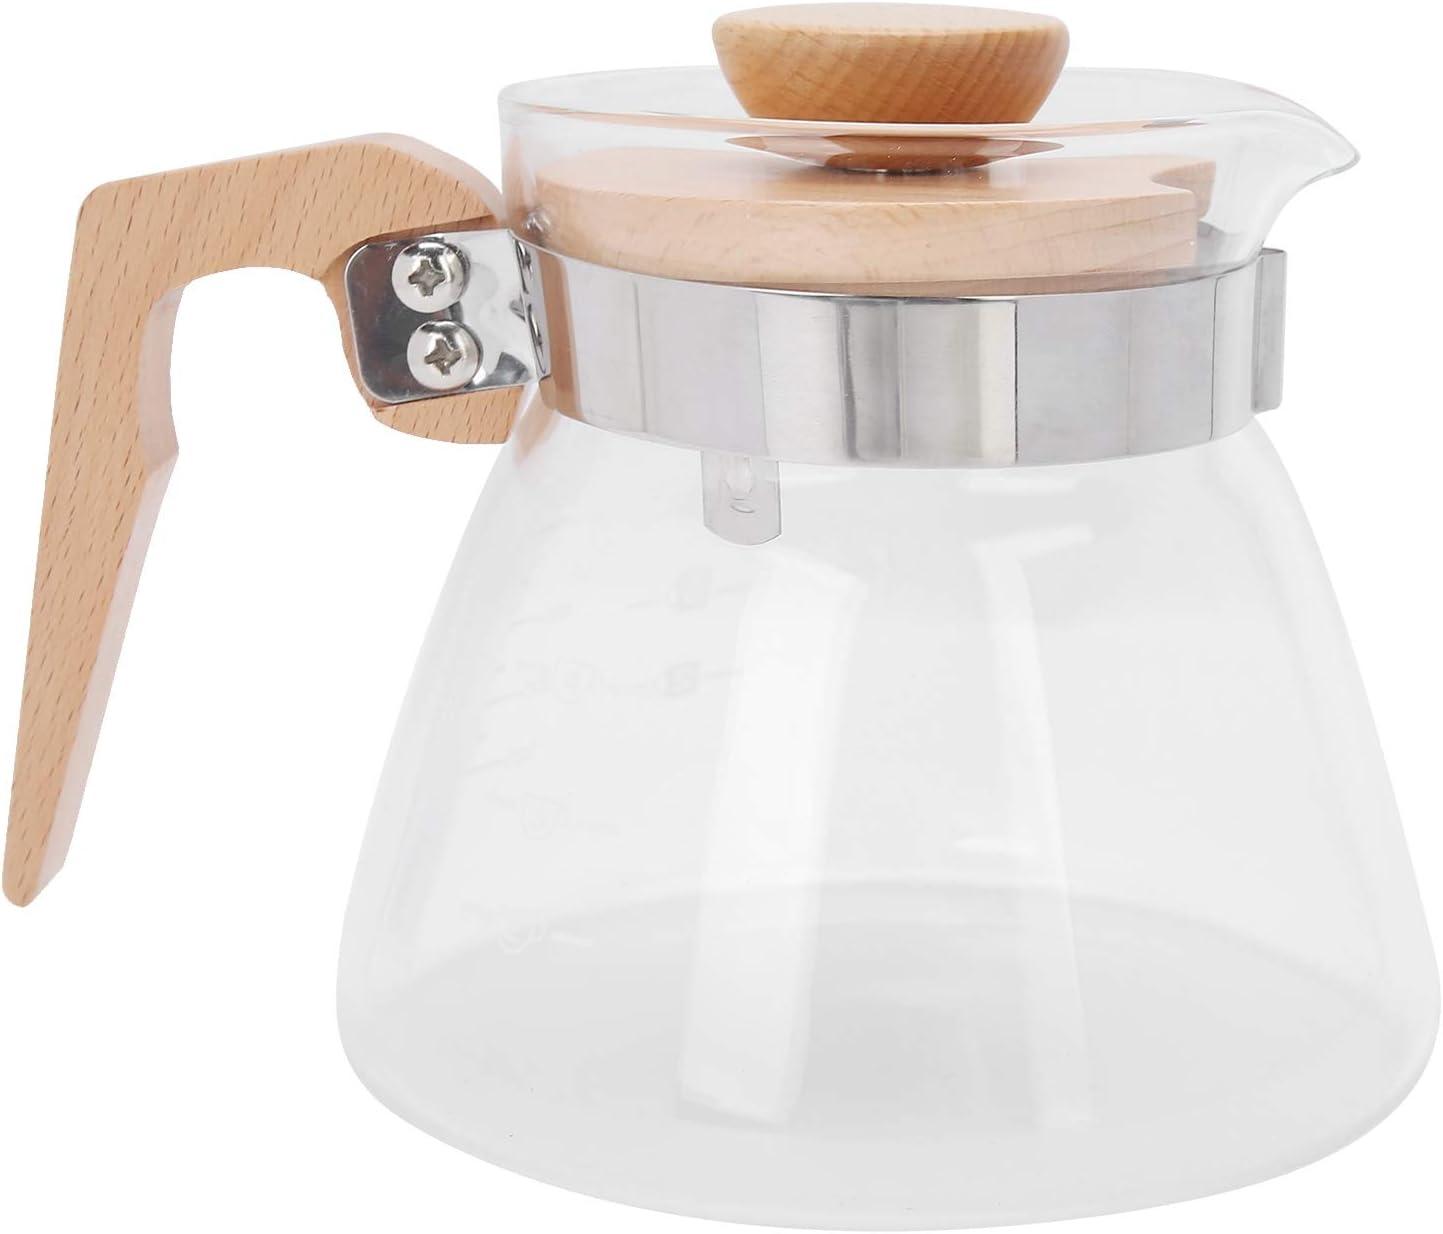 Coffee Kettle Glass Pot Handl famous Heat‑Resistant Wooden Over item handling